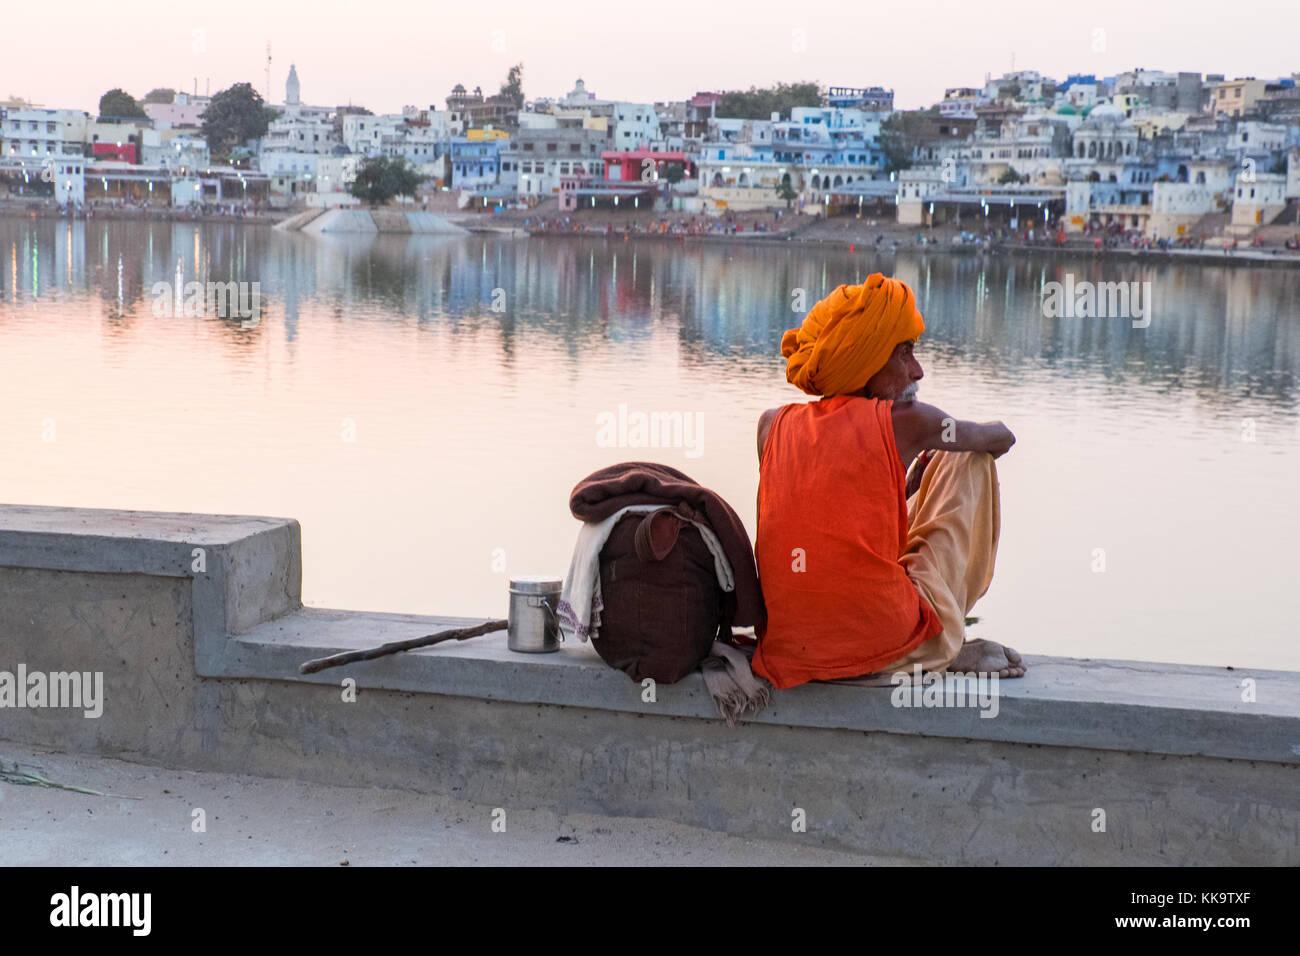 A Sadhu (holy man) at the sacred Pushkar Lake, Rajasthan,India - Stock Image